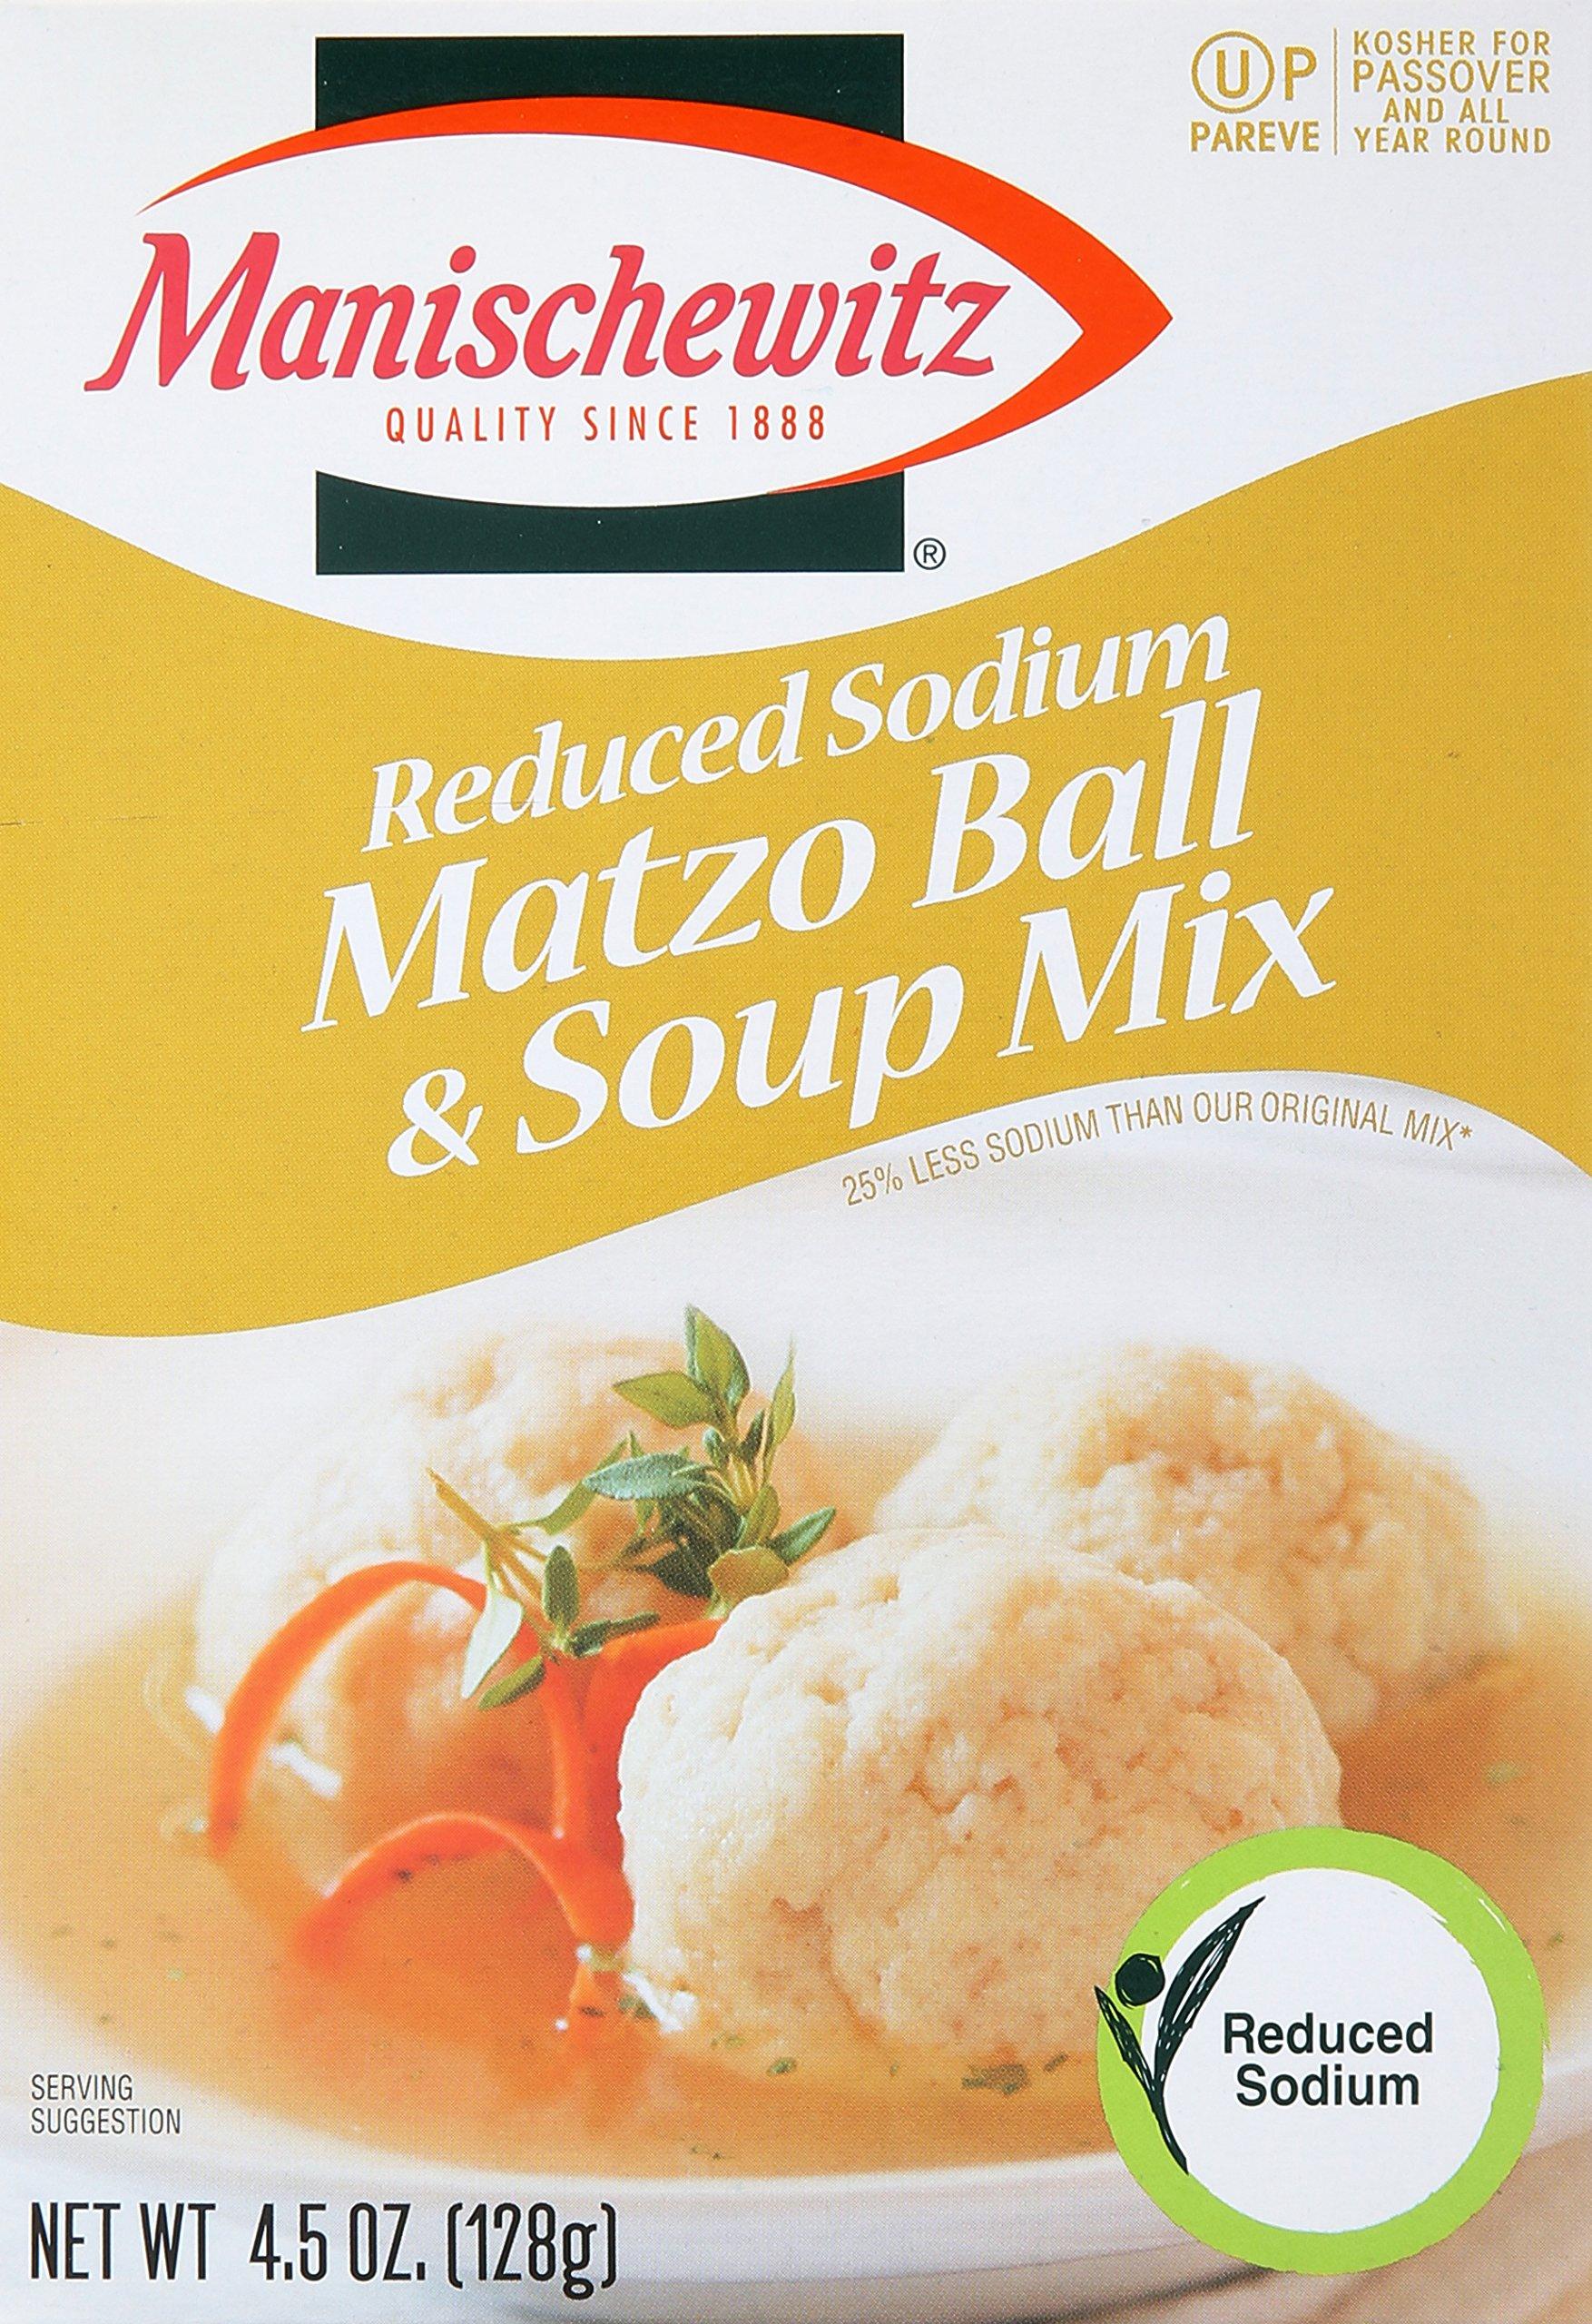 Matzo Ball & Soup Mix, Reduced Sodium, 4.5 oz